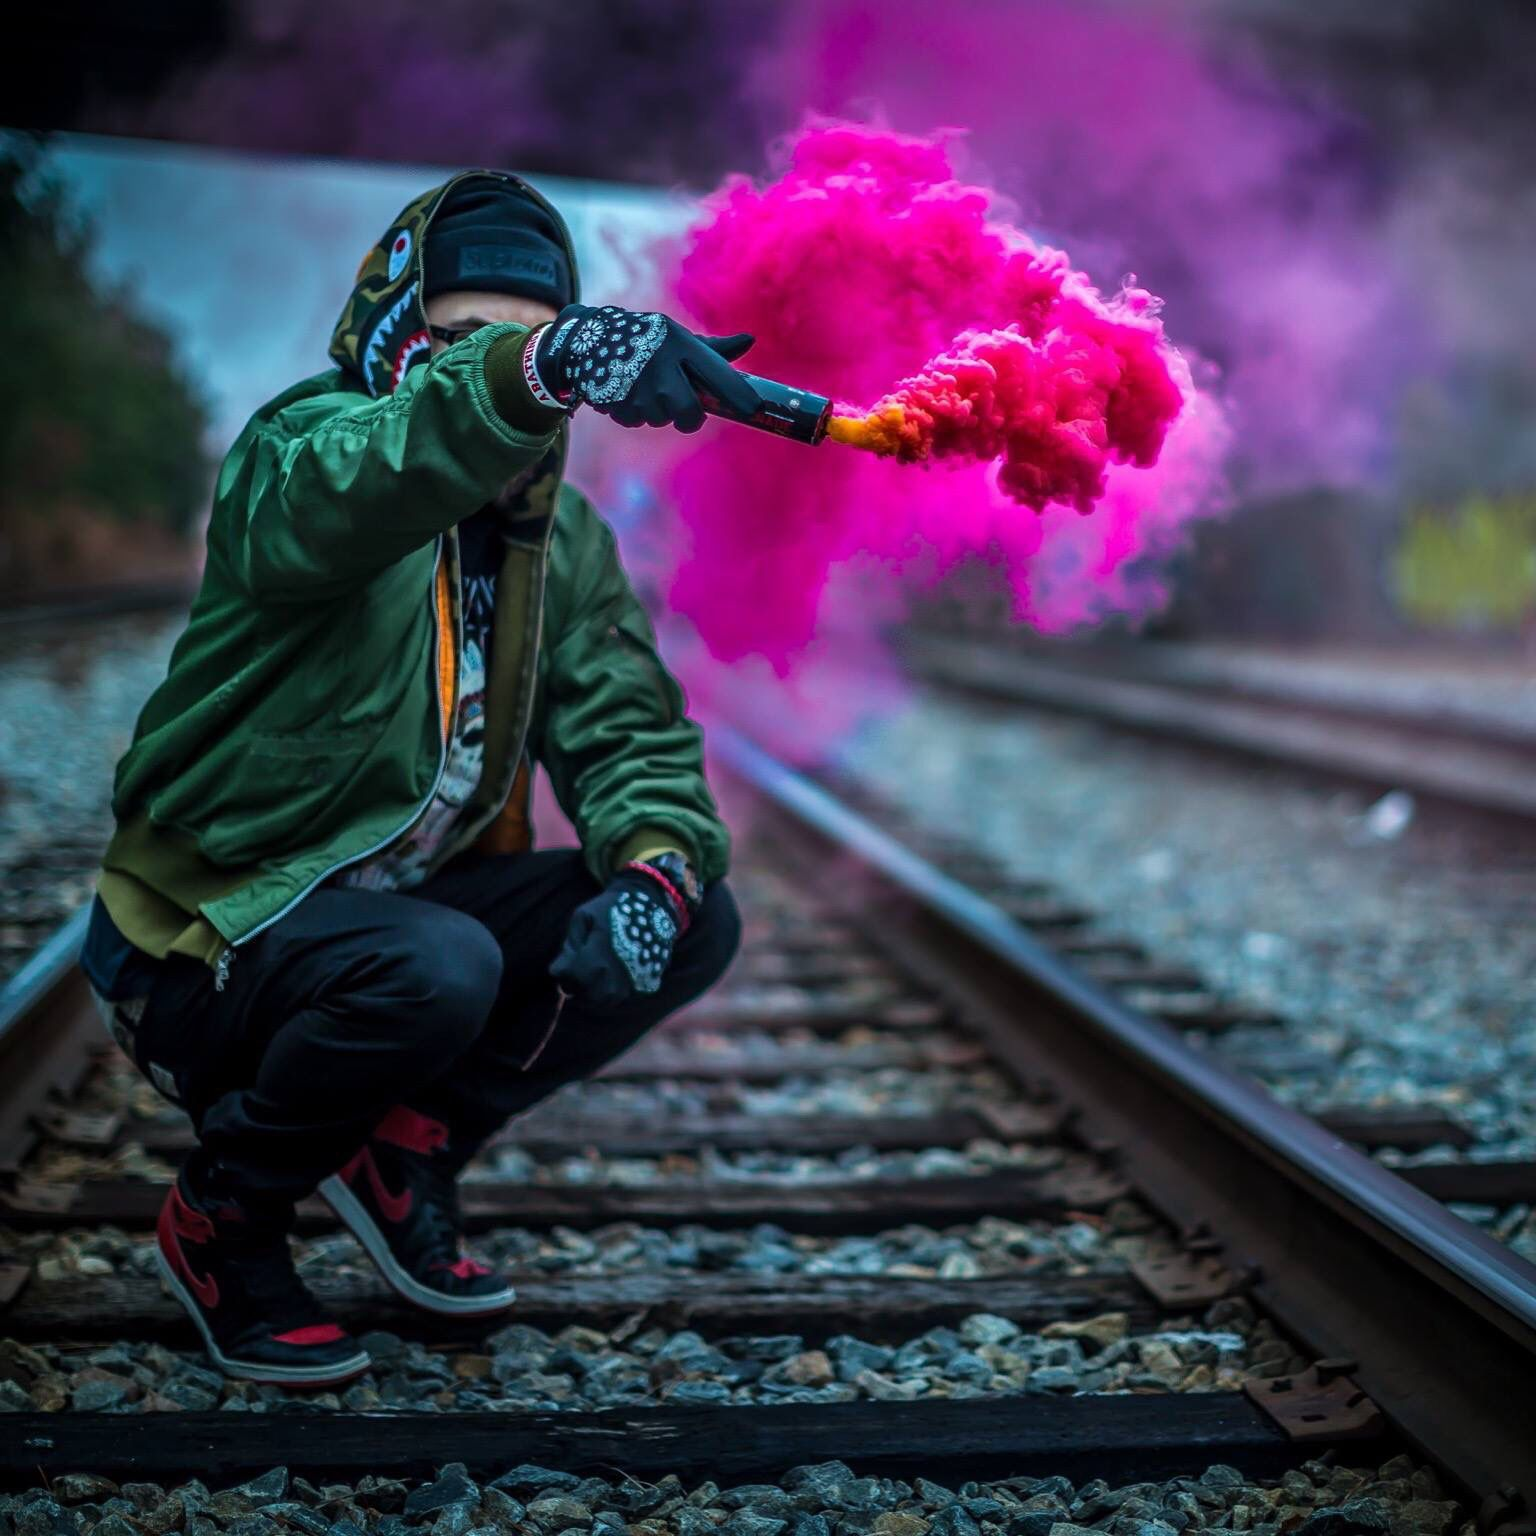 bomba de humo rosa